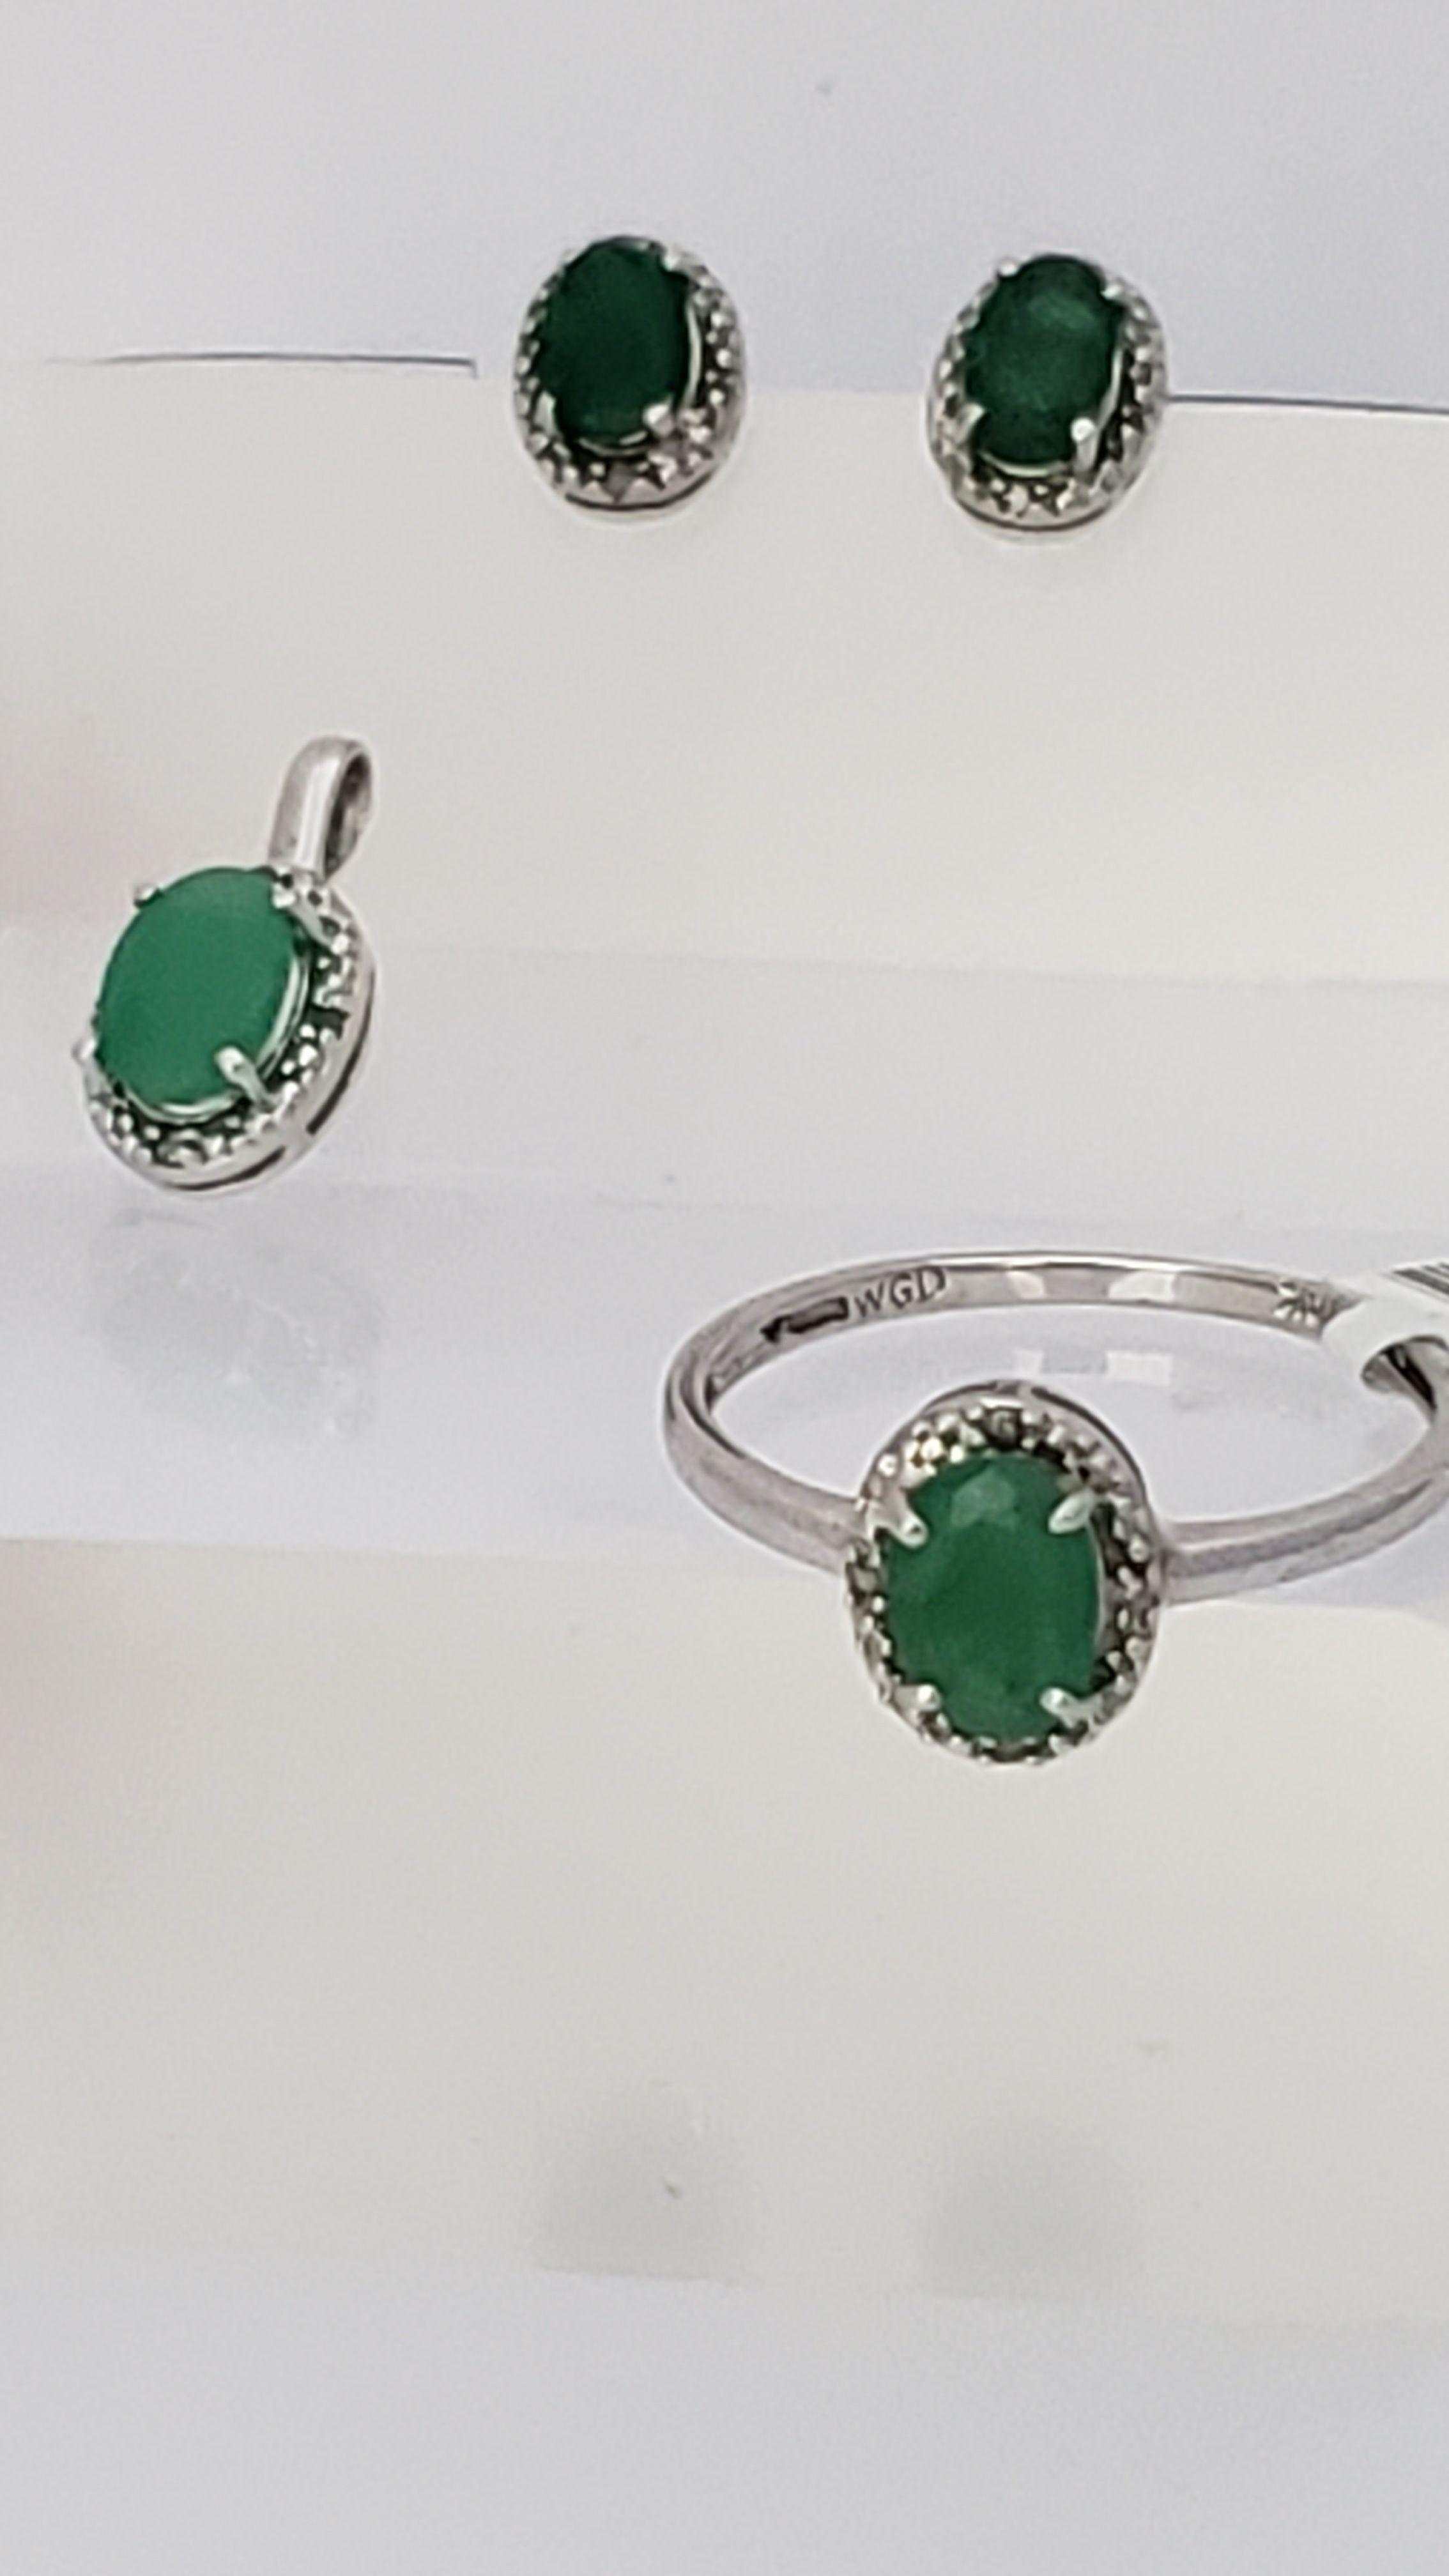 Set Aretes Anillo y Dije Esmeralada Con Diamante